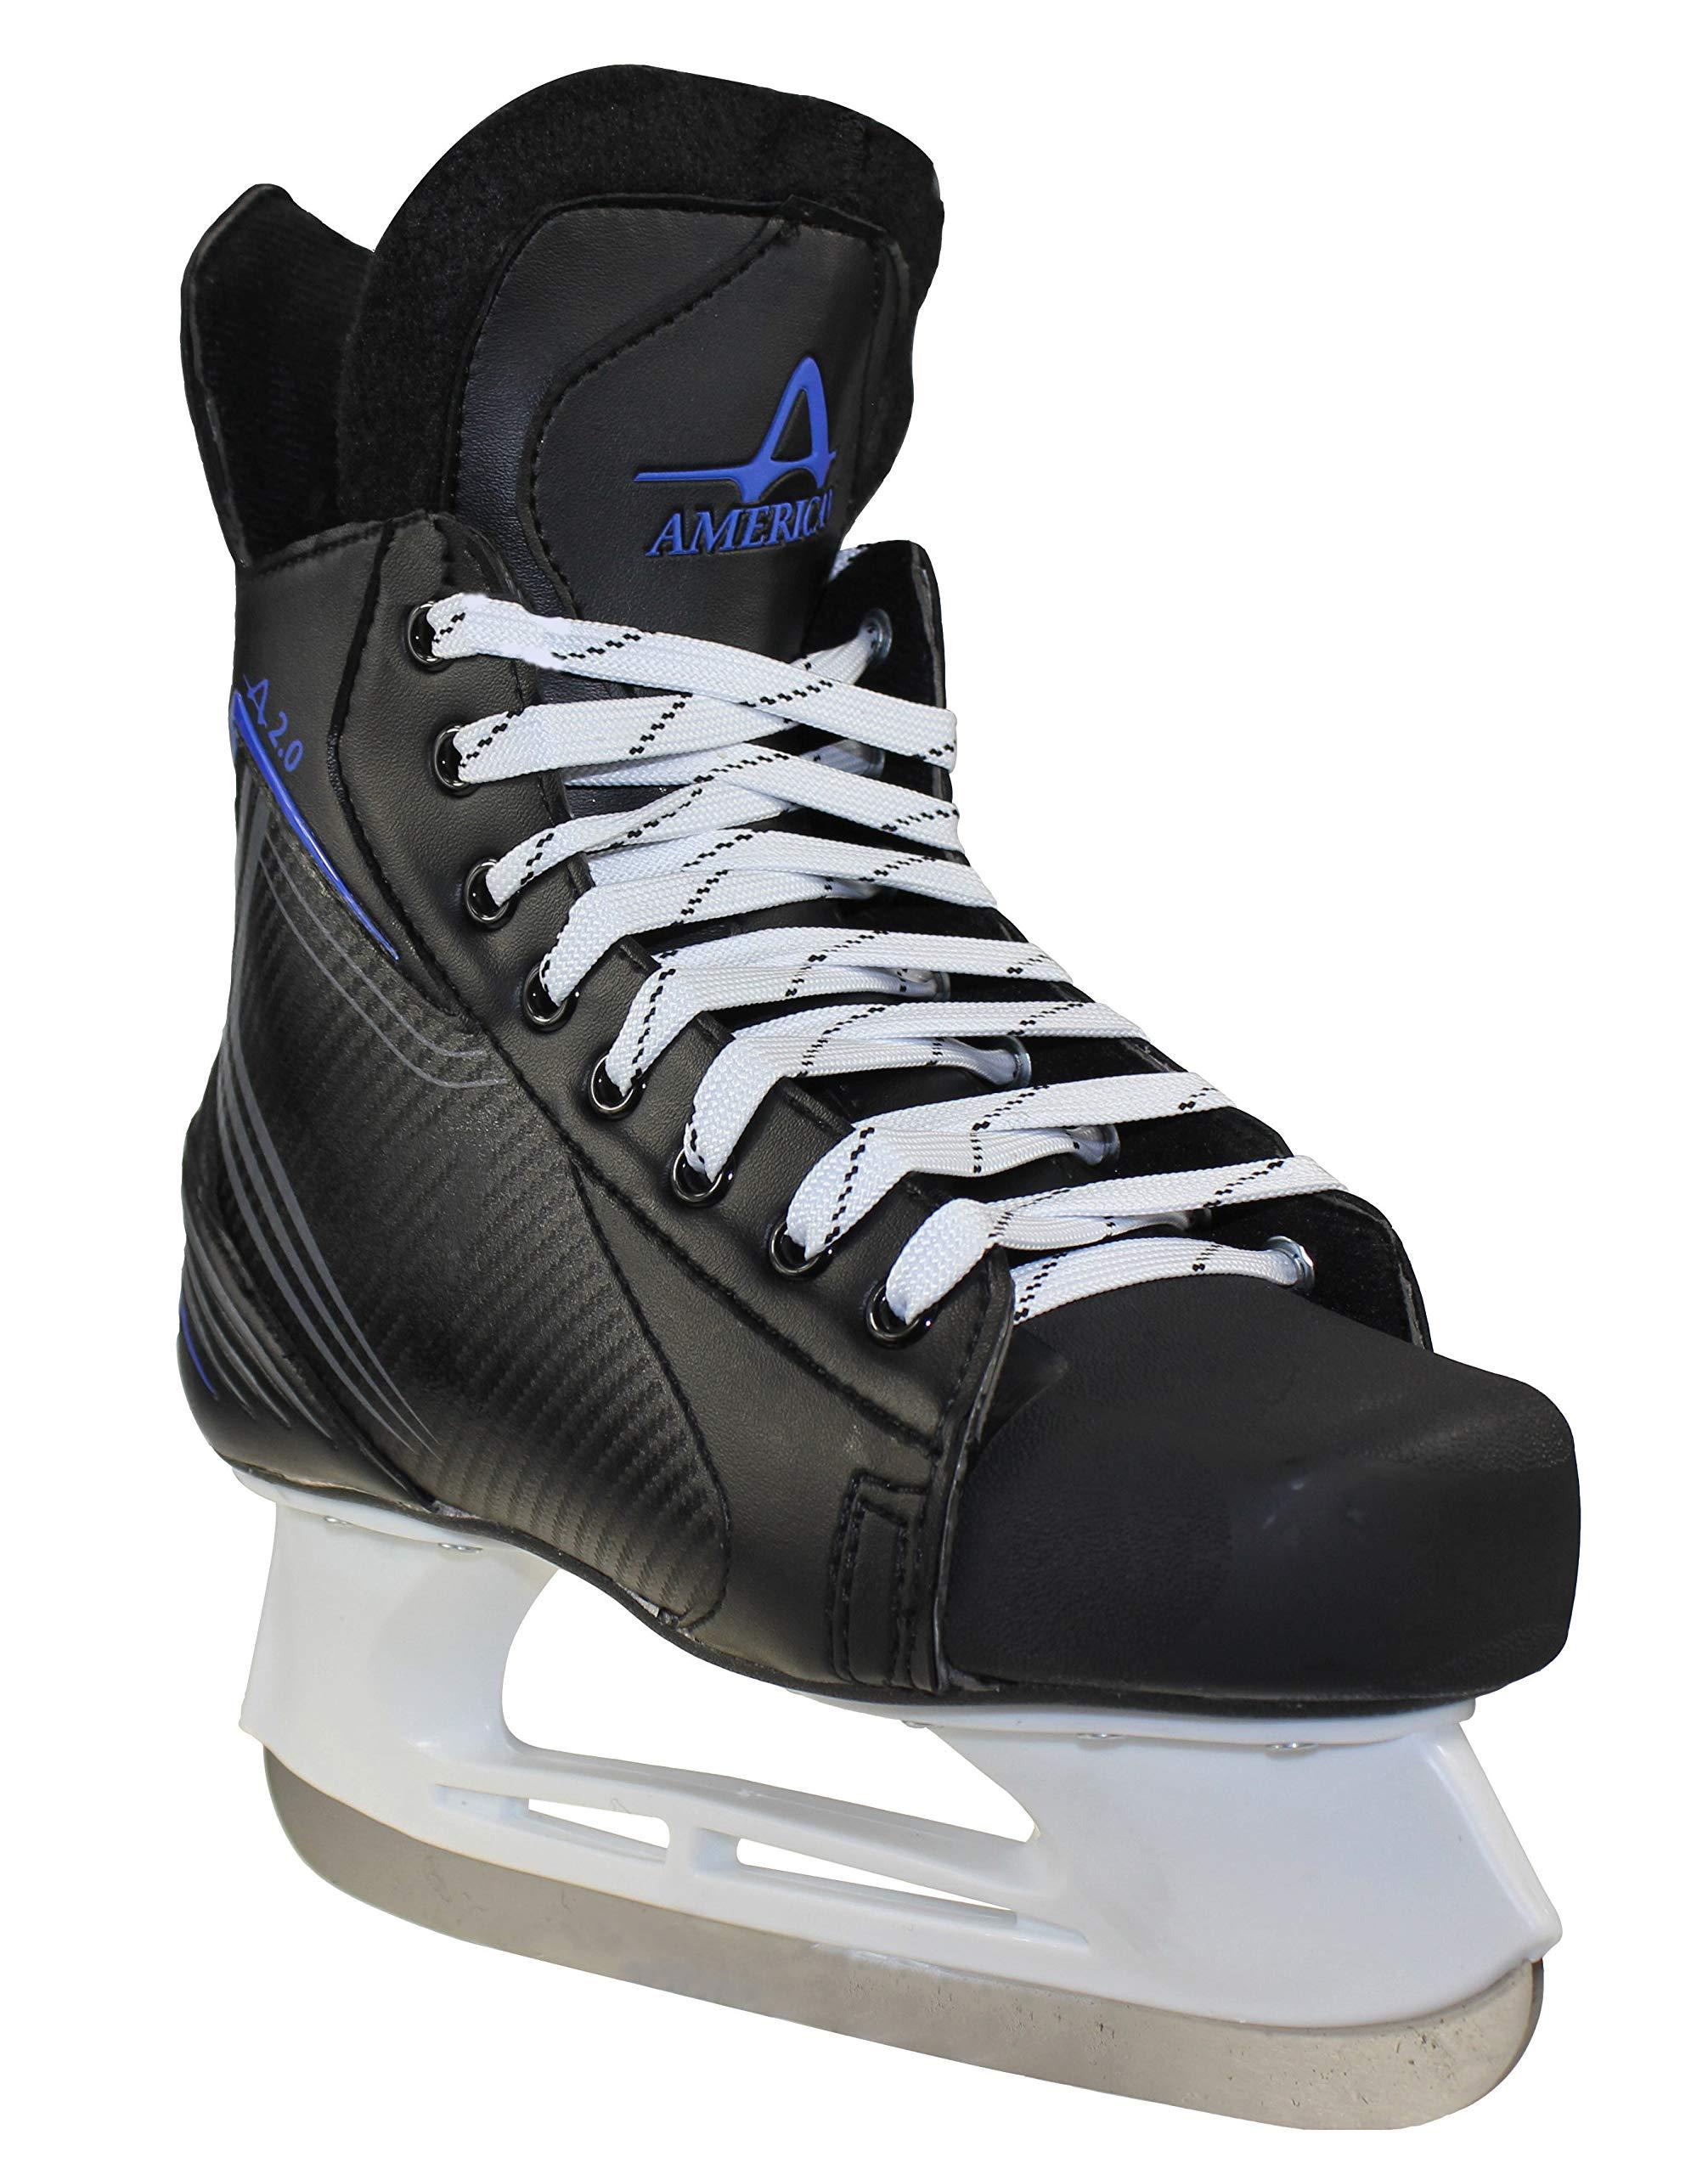 American Athletic Shoe Boy's Ice Force Hockey Skates, Black, 2 Y